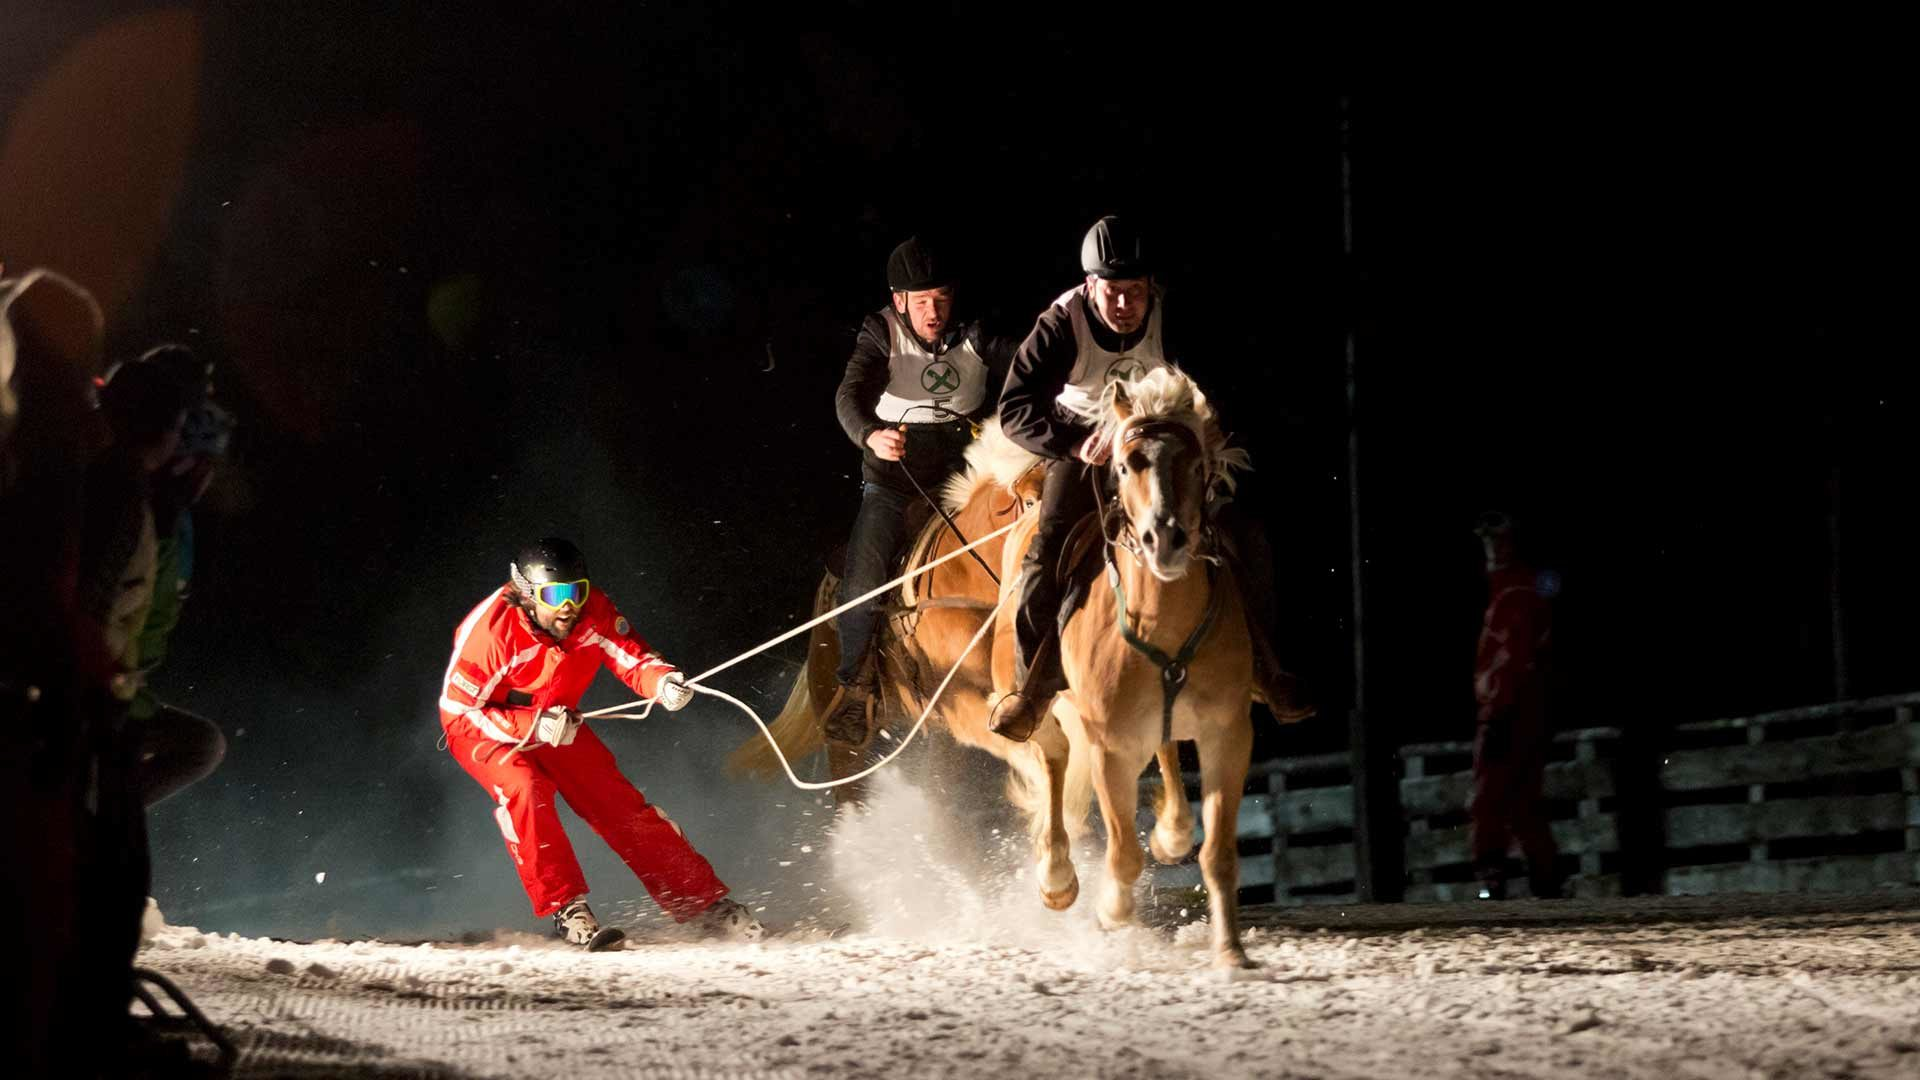 Nacht-Skikjöring mit Haflinger Pferden